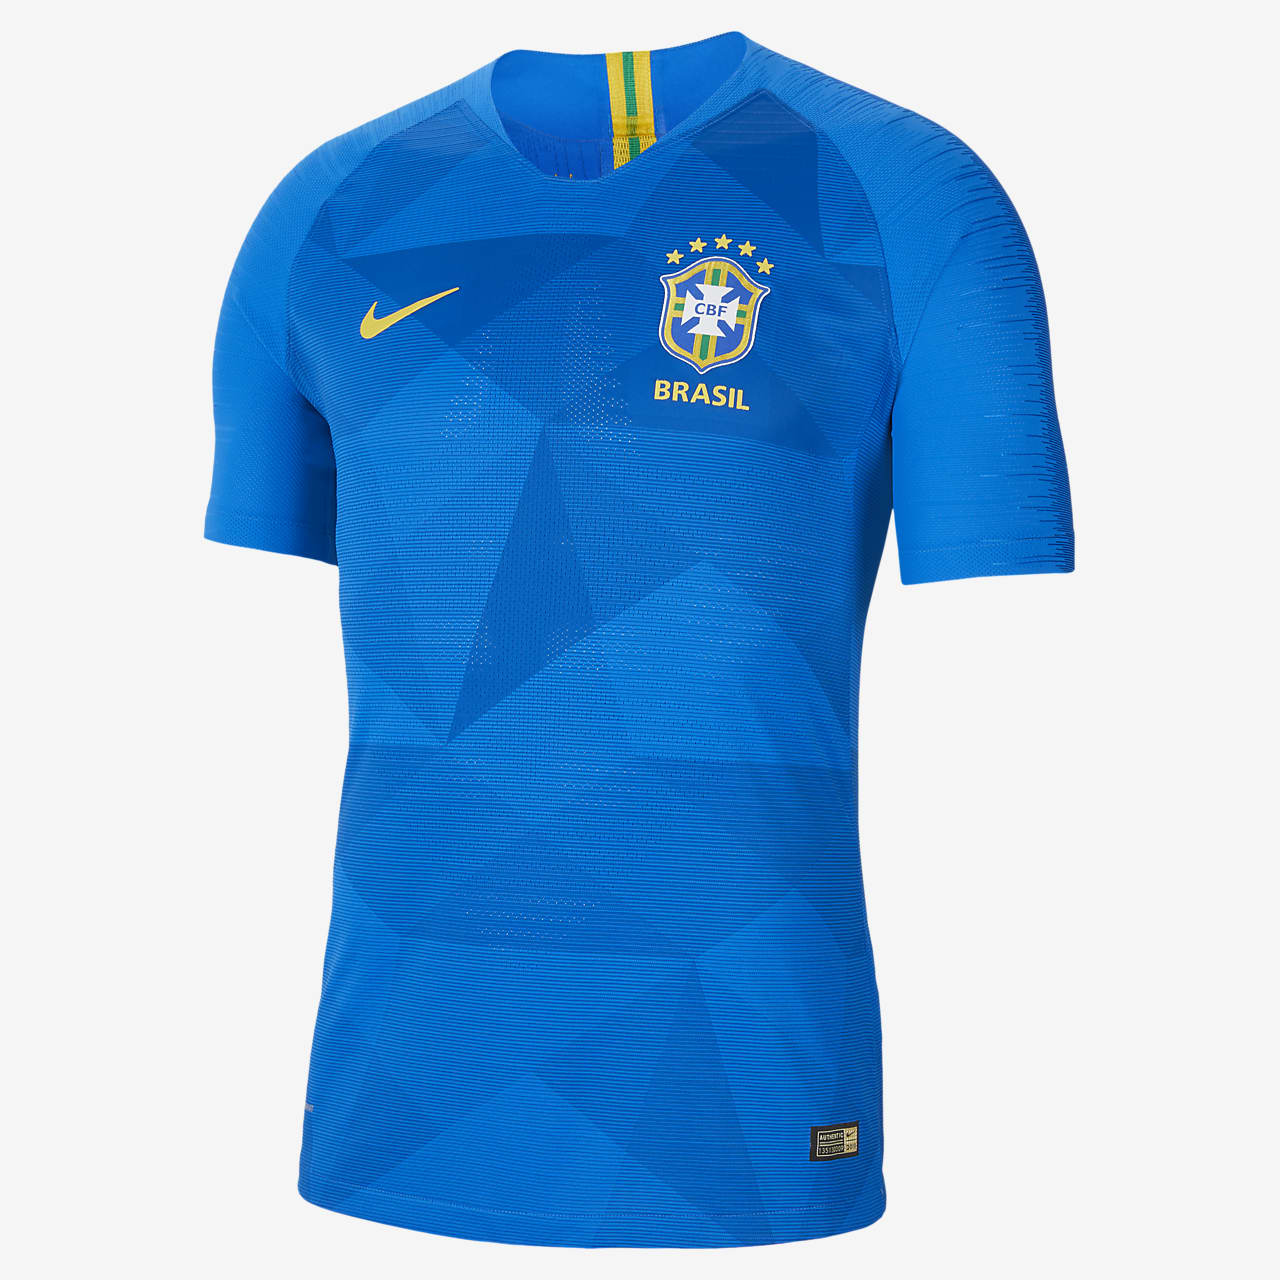 Camiseta de fútbol para hombre 2018 Brasil CBF Vapor Match Away ... e402f9193bf2d